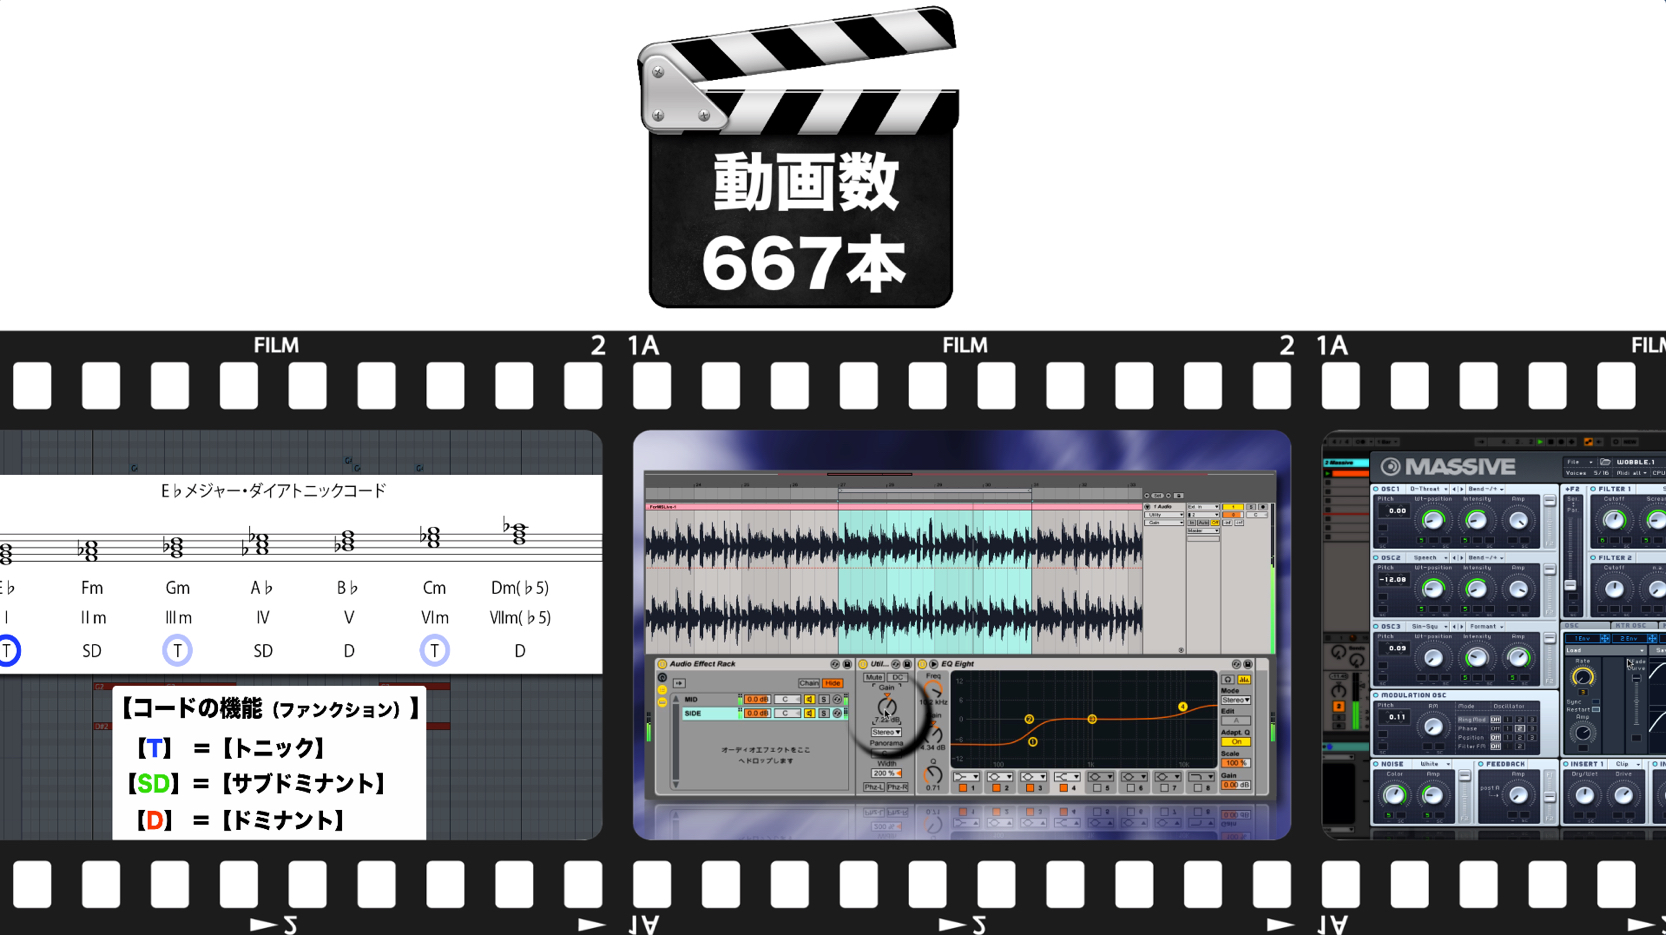 Youtube_動画公開本数_667本